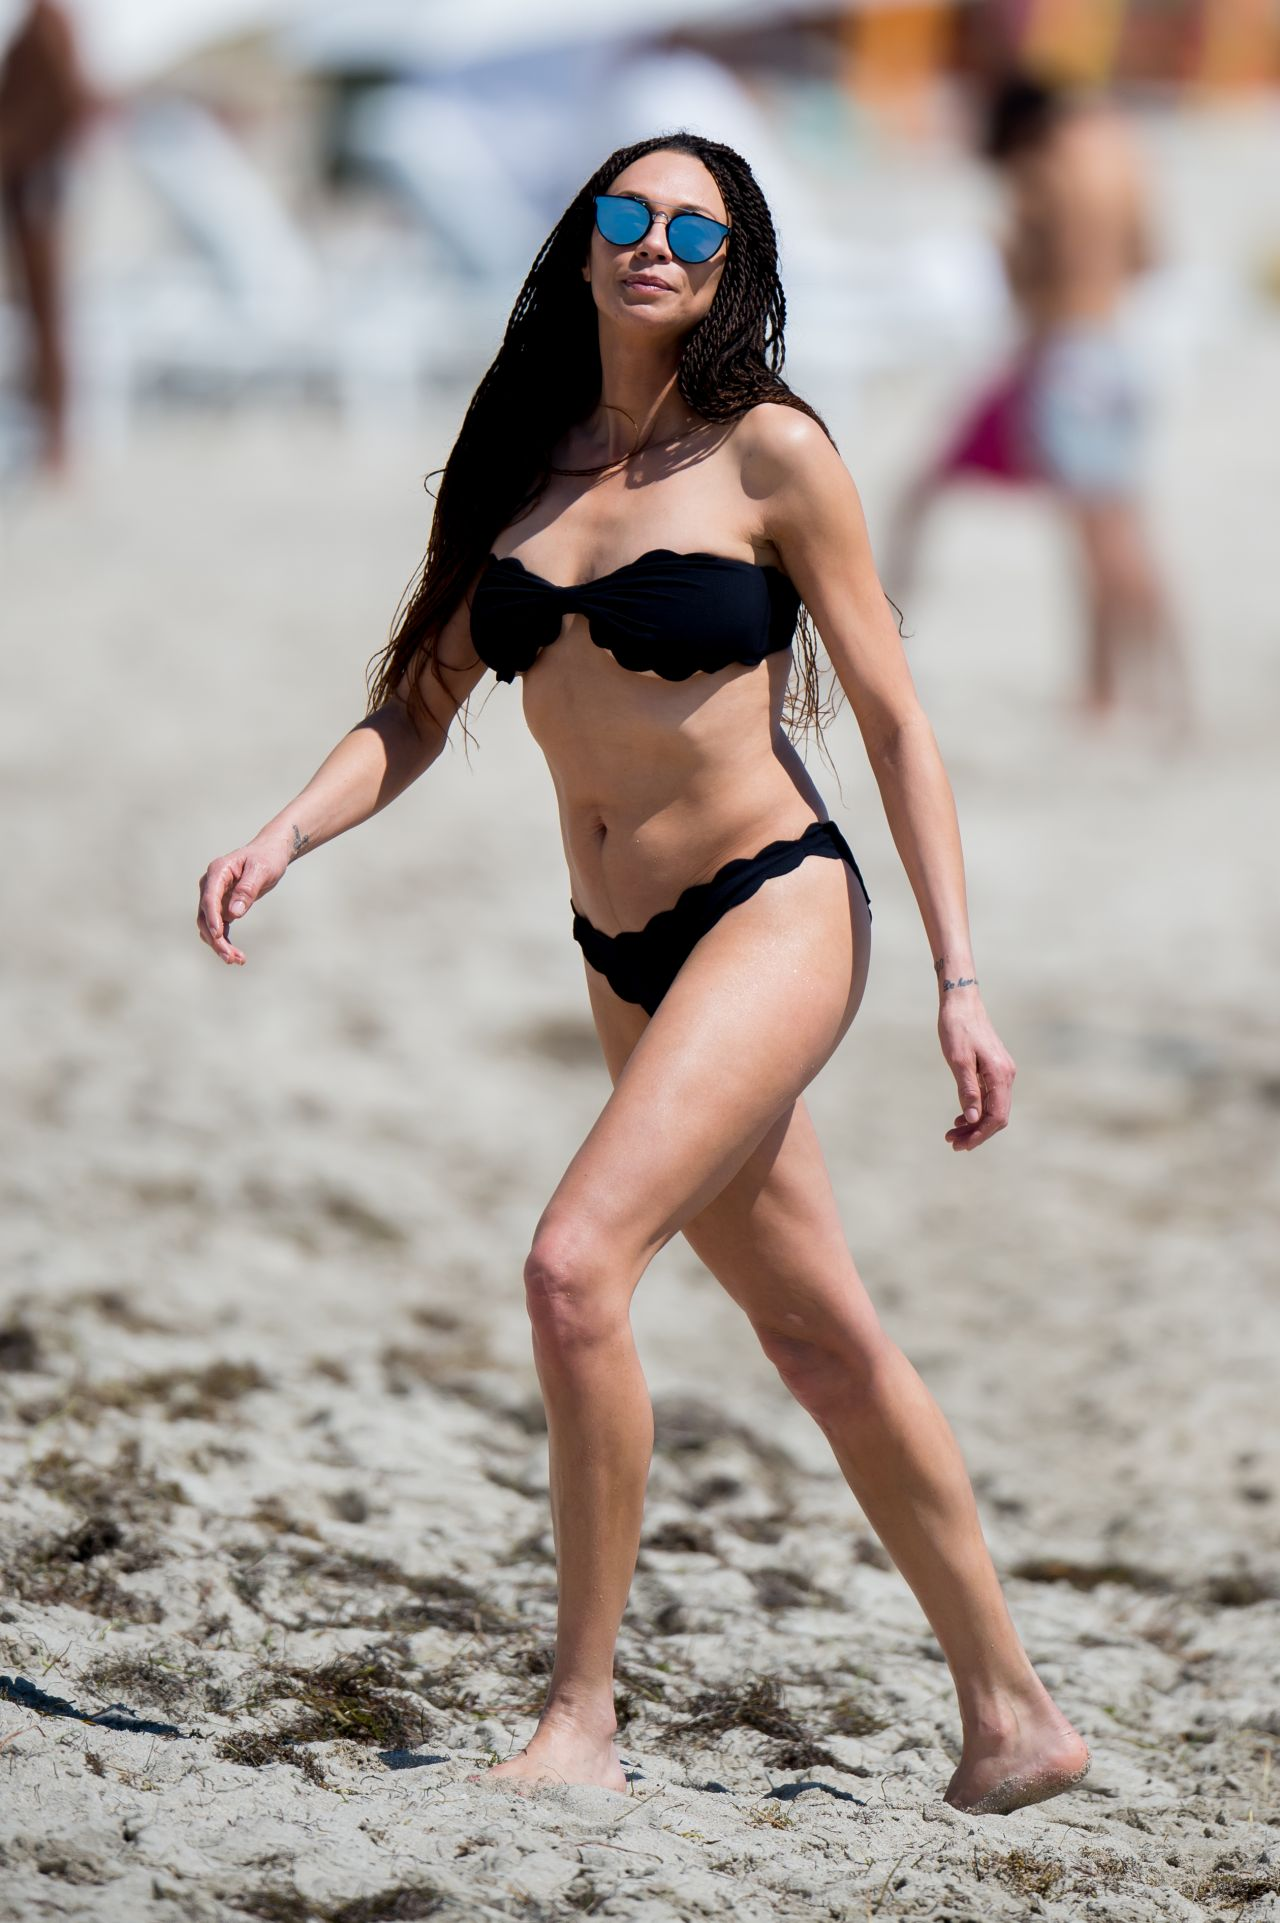 Lilly Becker In Bikini In Miami Beach 03 25 2018